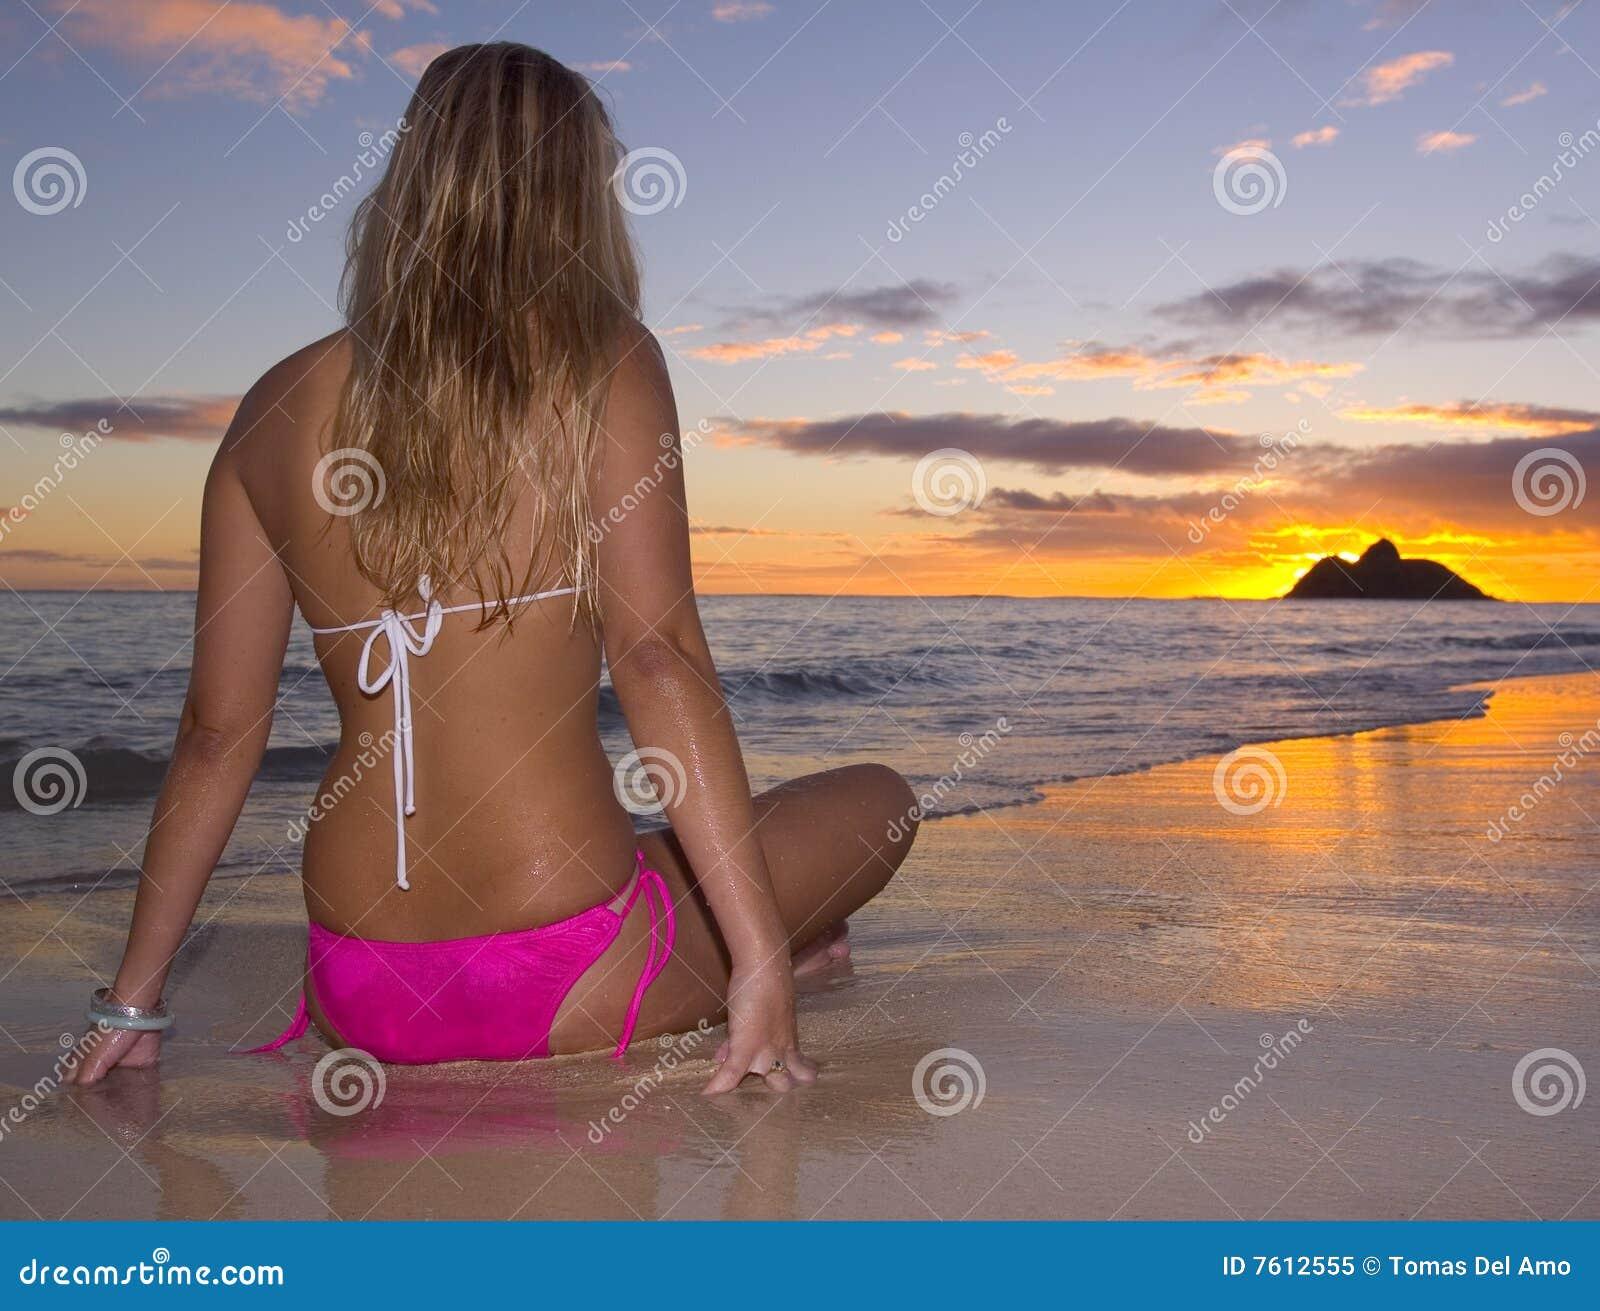 Barbusige frau am strand